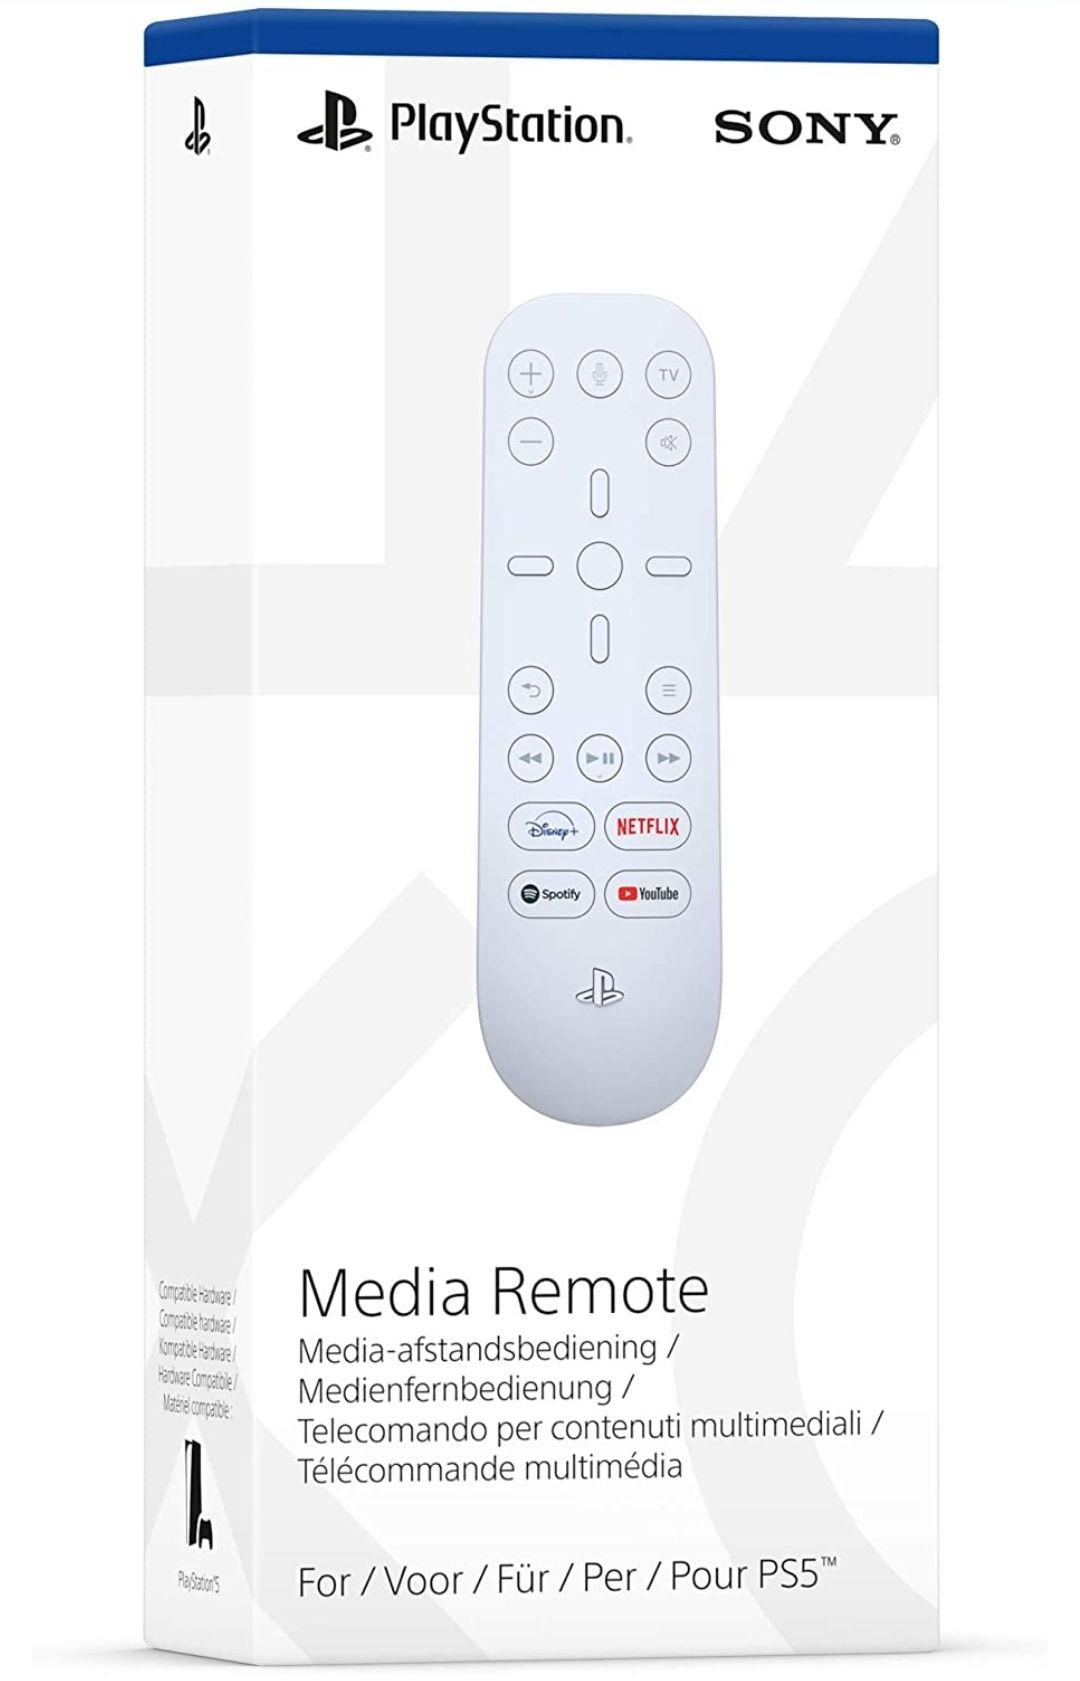 PS5 Media Remote £21 at Tesco Cambridge